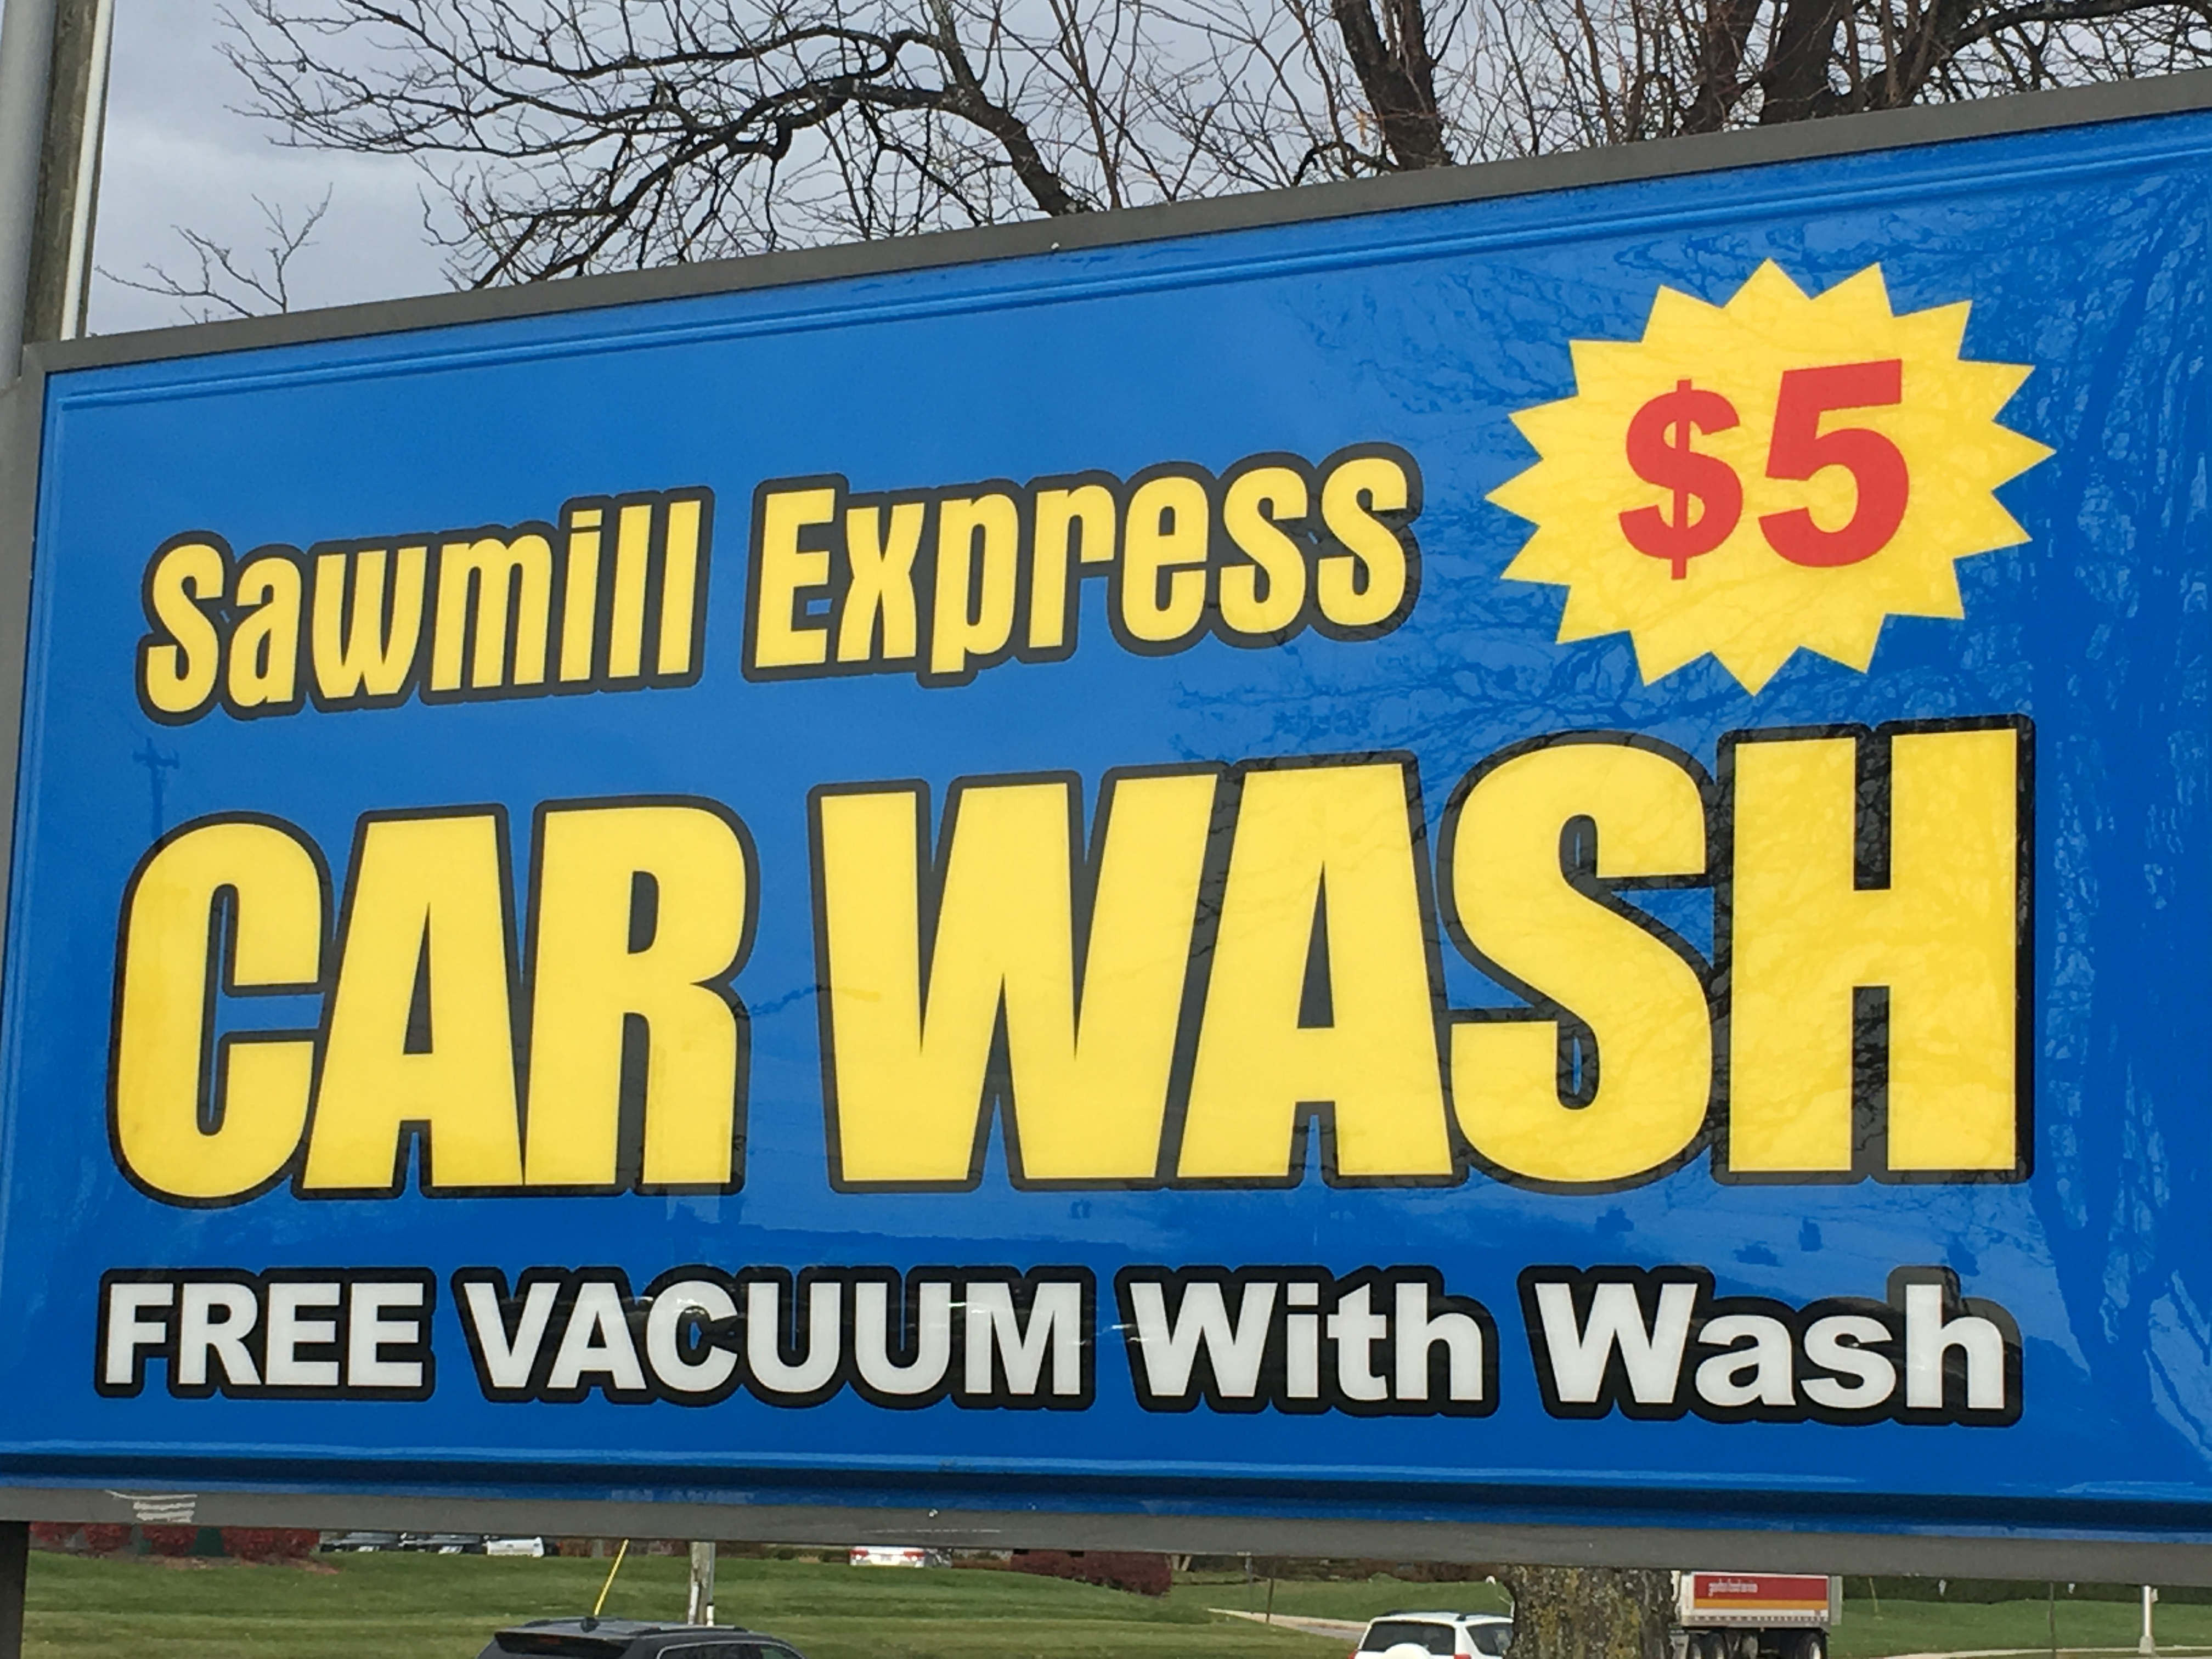 Sawmill Express Car Wash